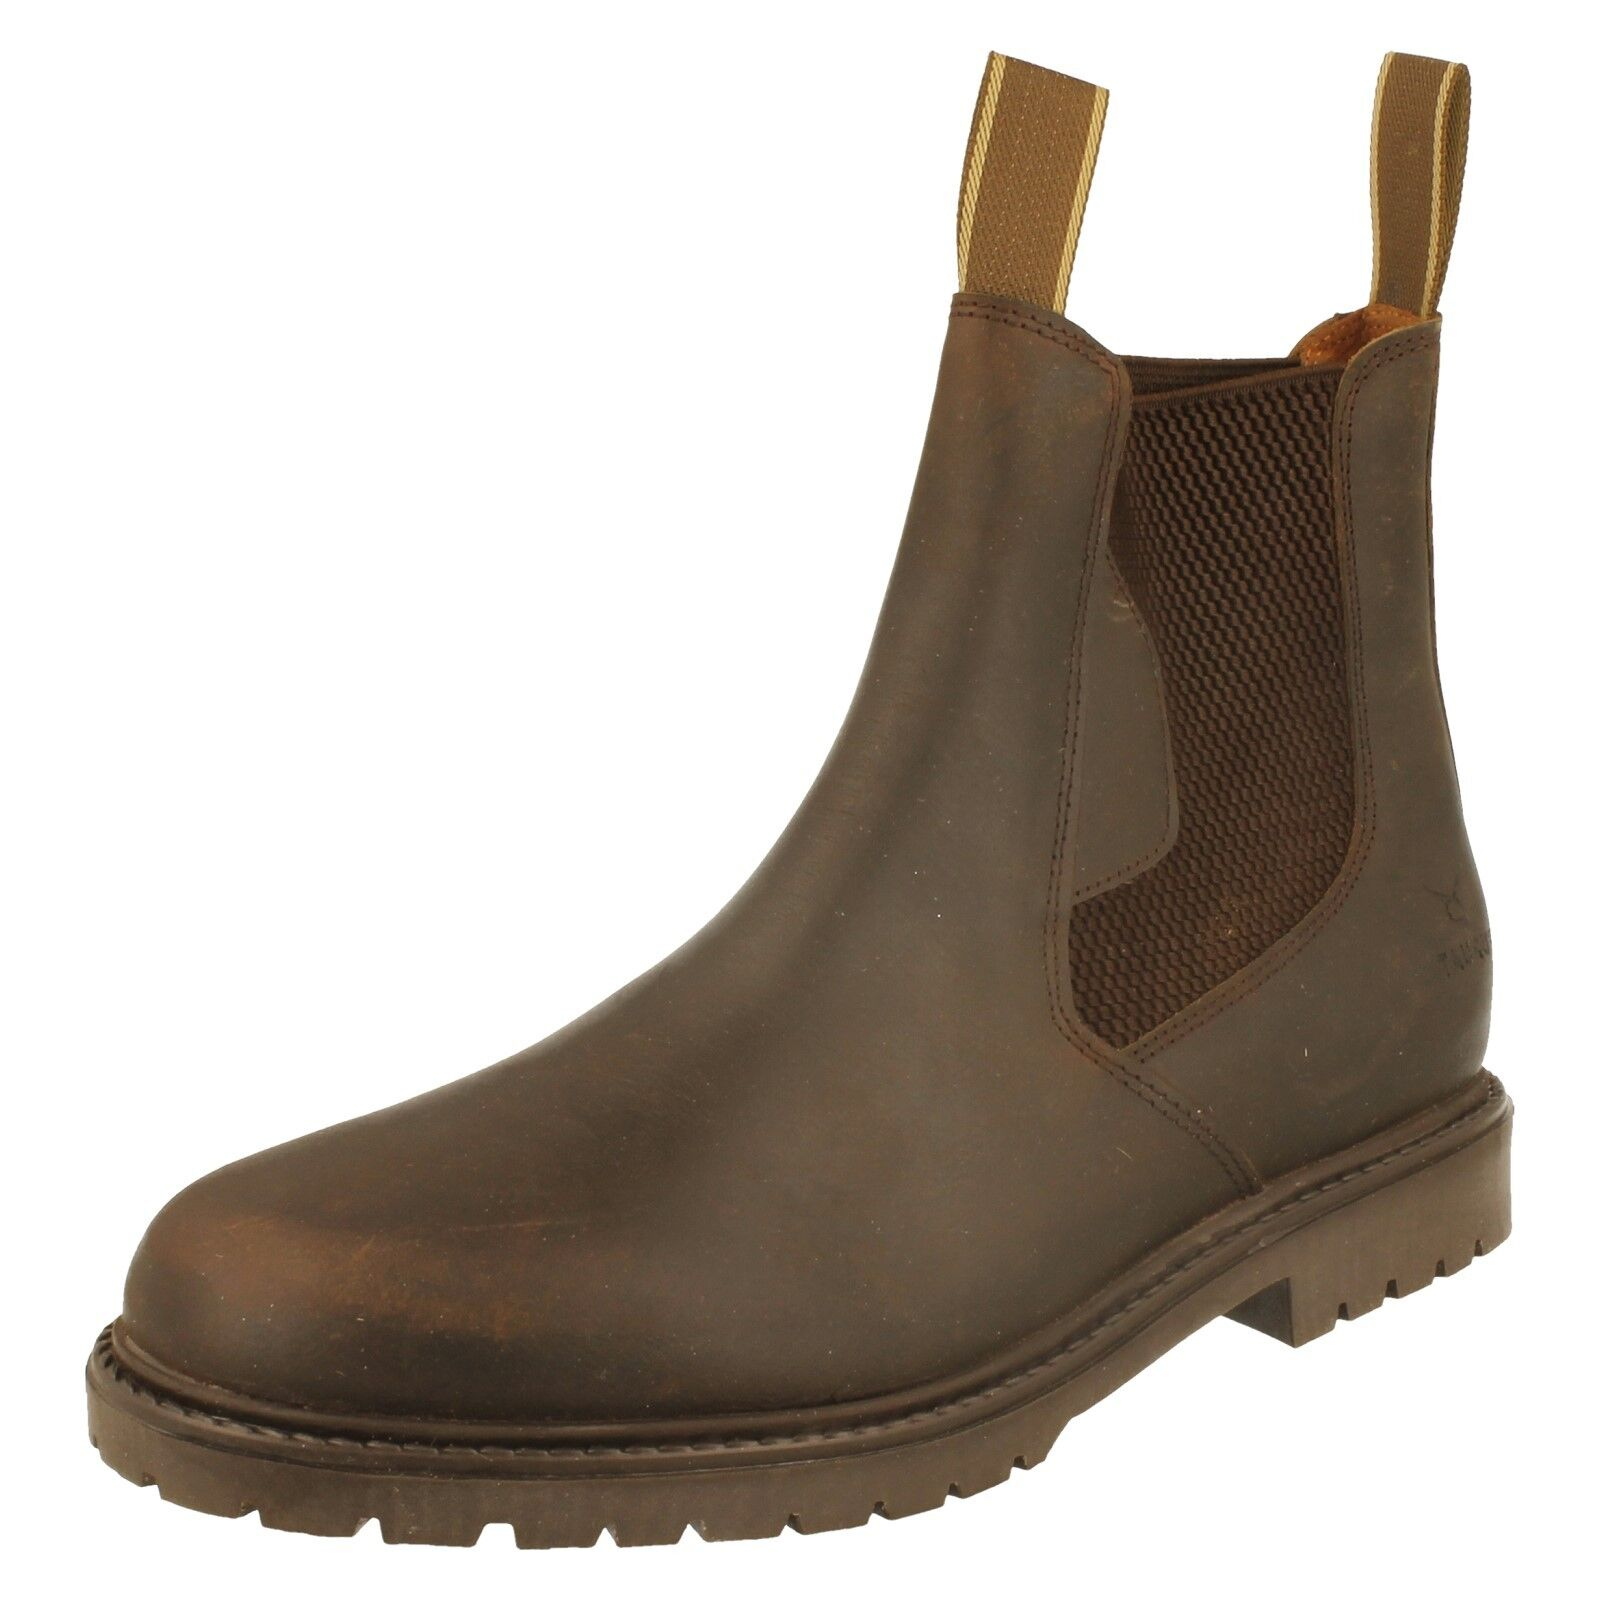 Billig gute Qualität Mens Taurus Boots - Dealer